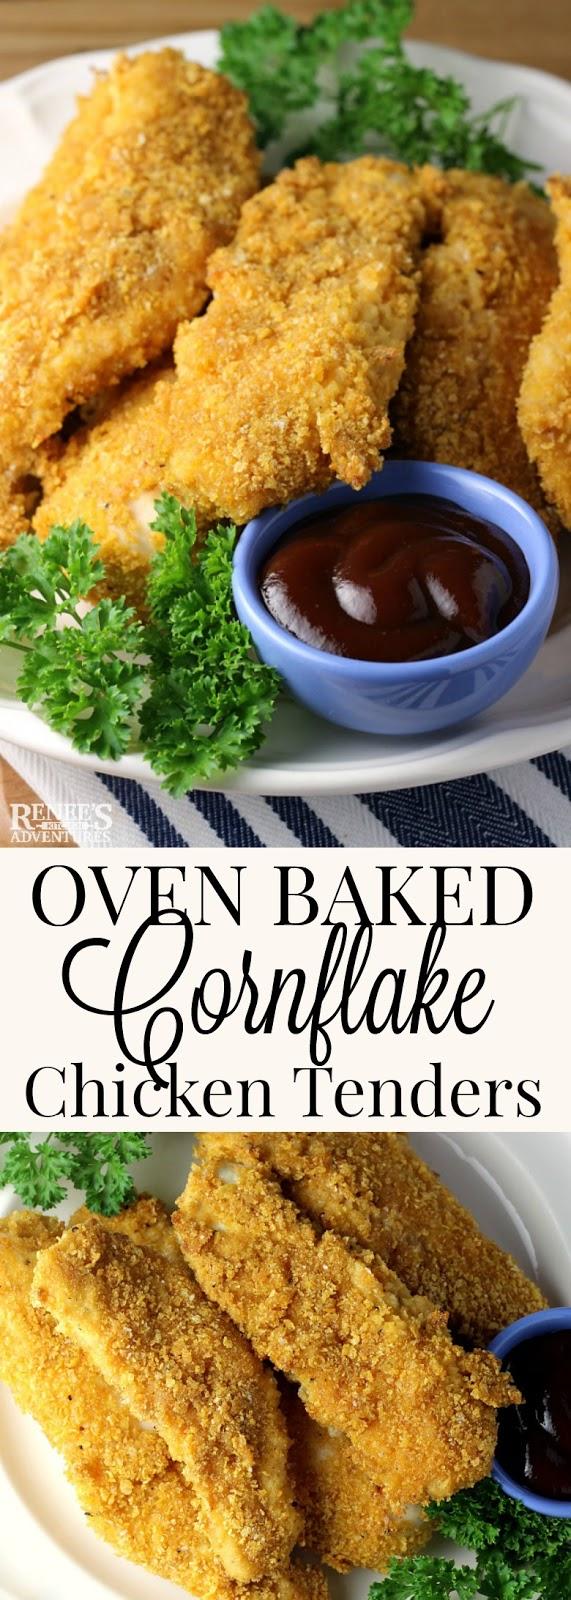 Cornflake Chicken Tenders | Renee's Kitchen Adventures